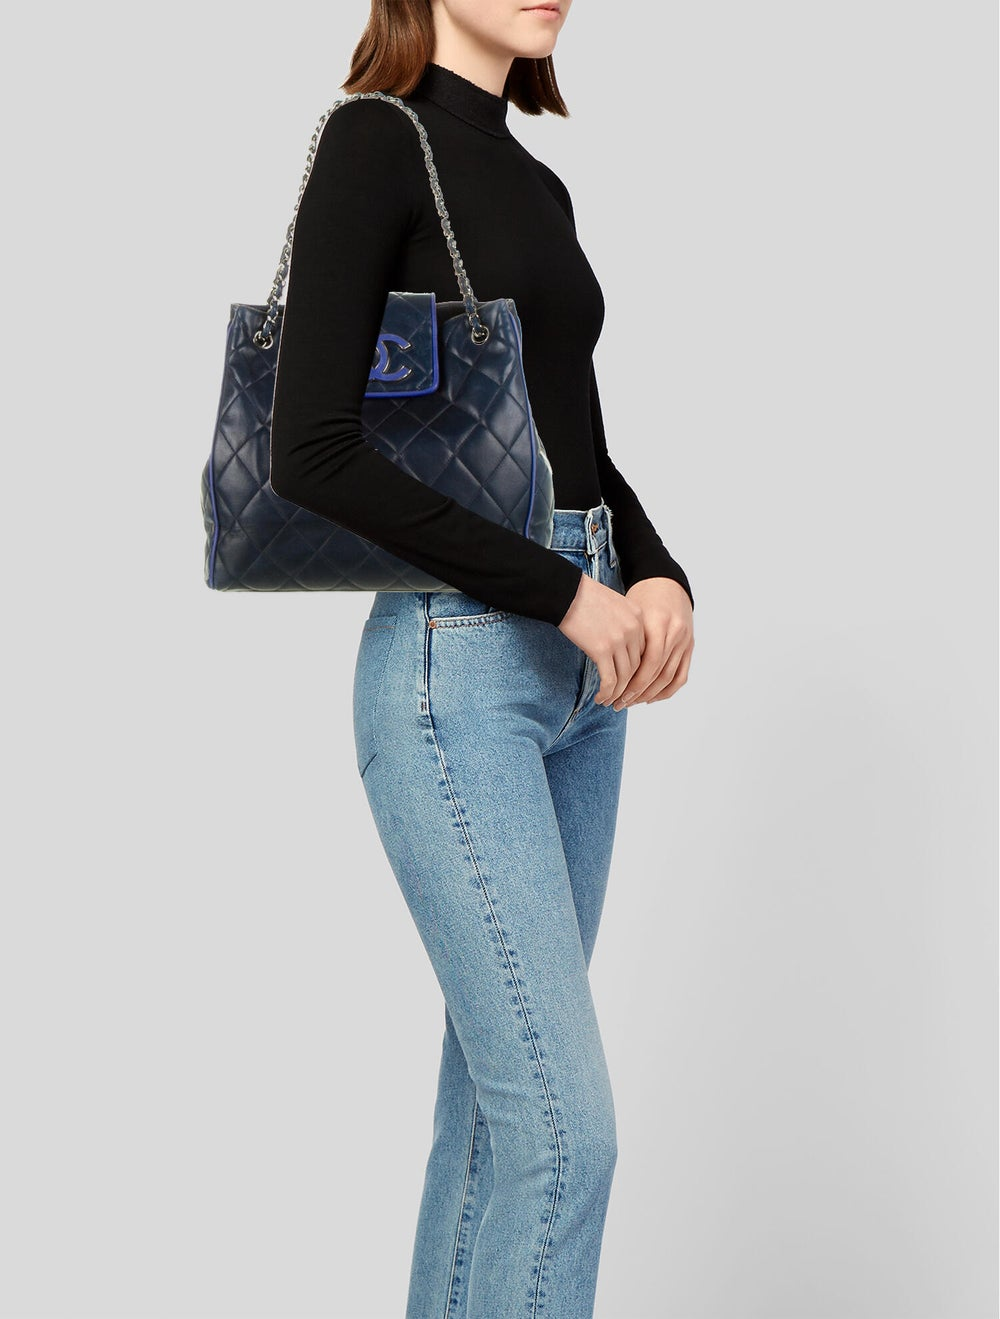 Chanel Hamptons CC Accordion Flap Bag Blue - image 2